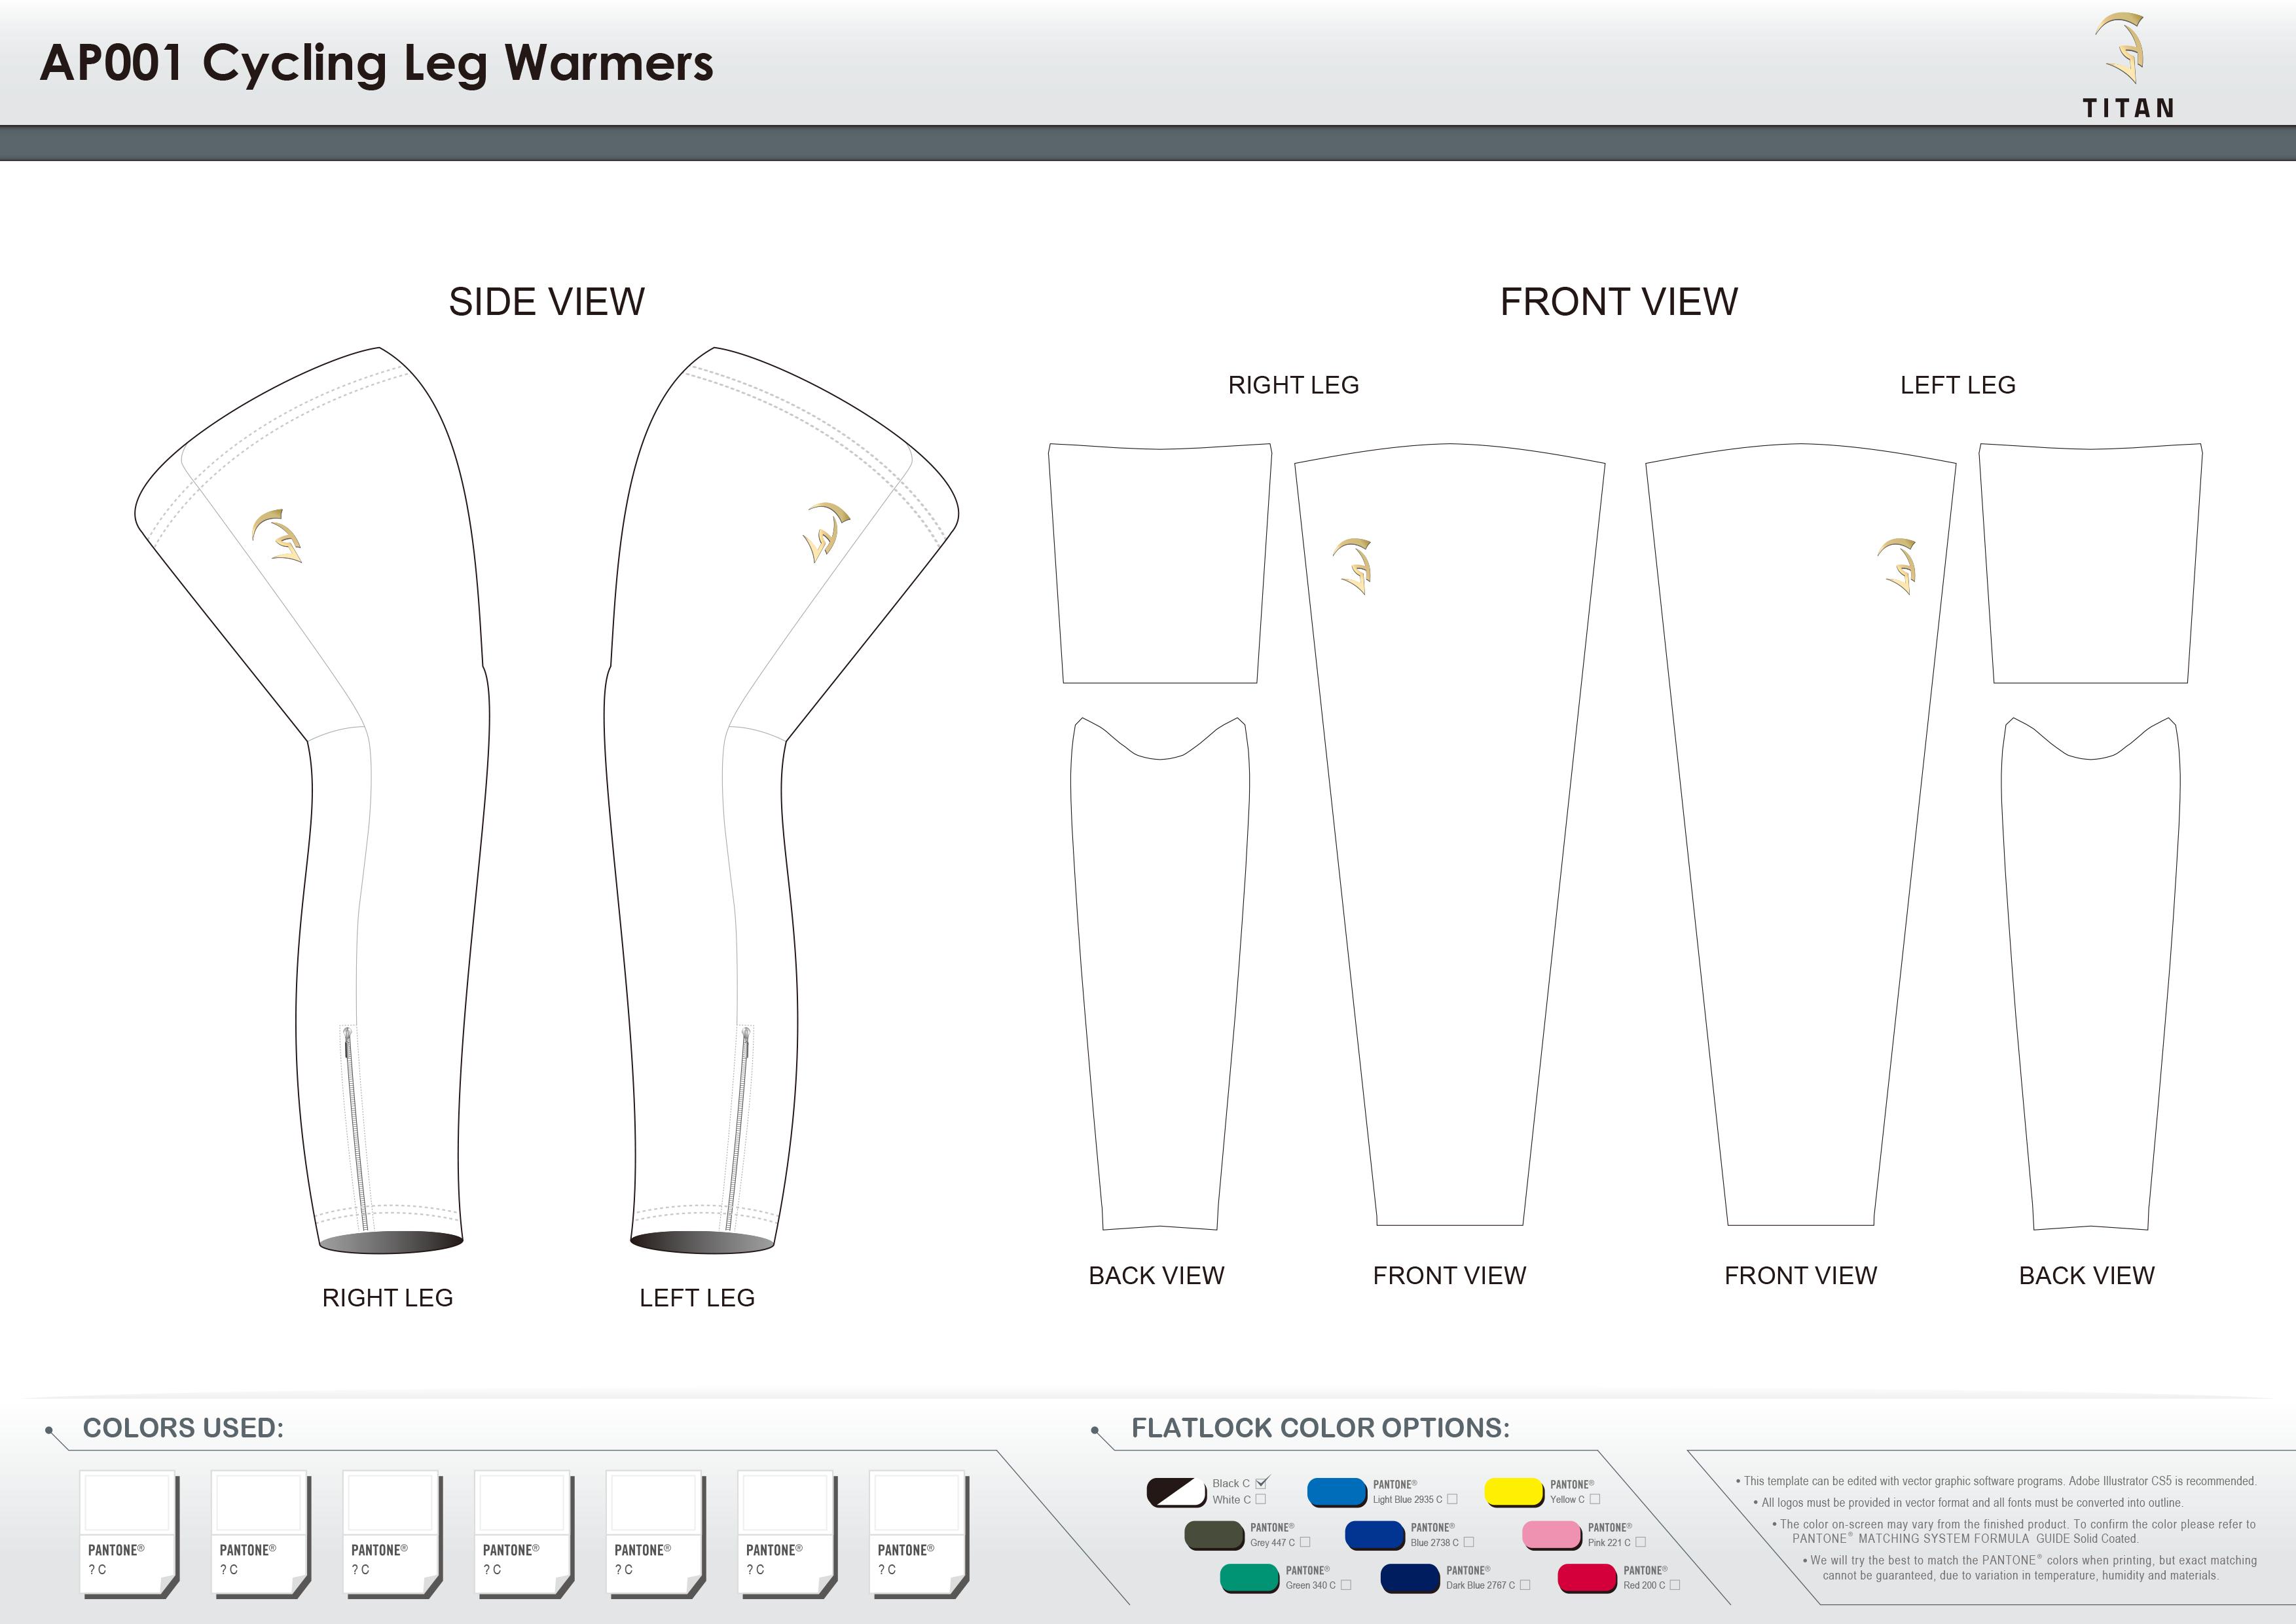 AP001 Cycling Leg Warmers